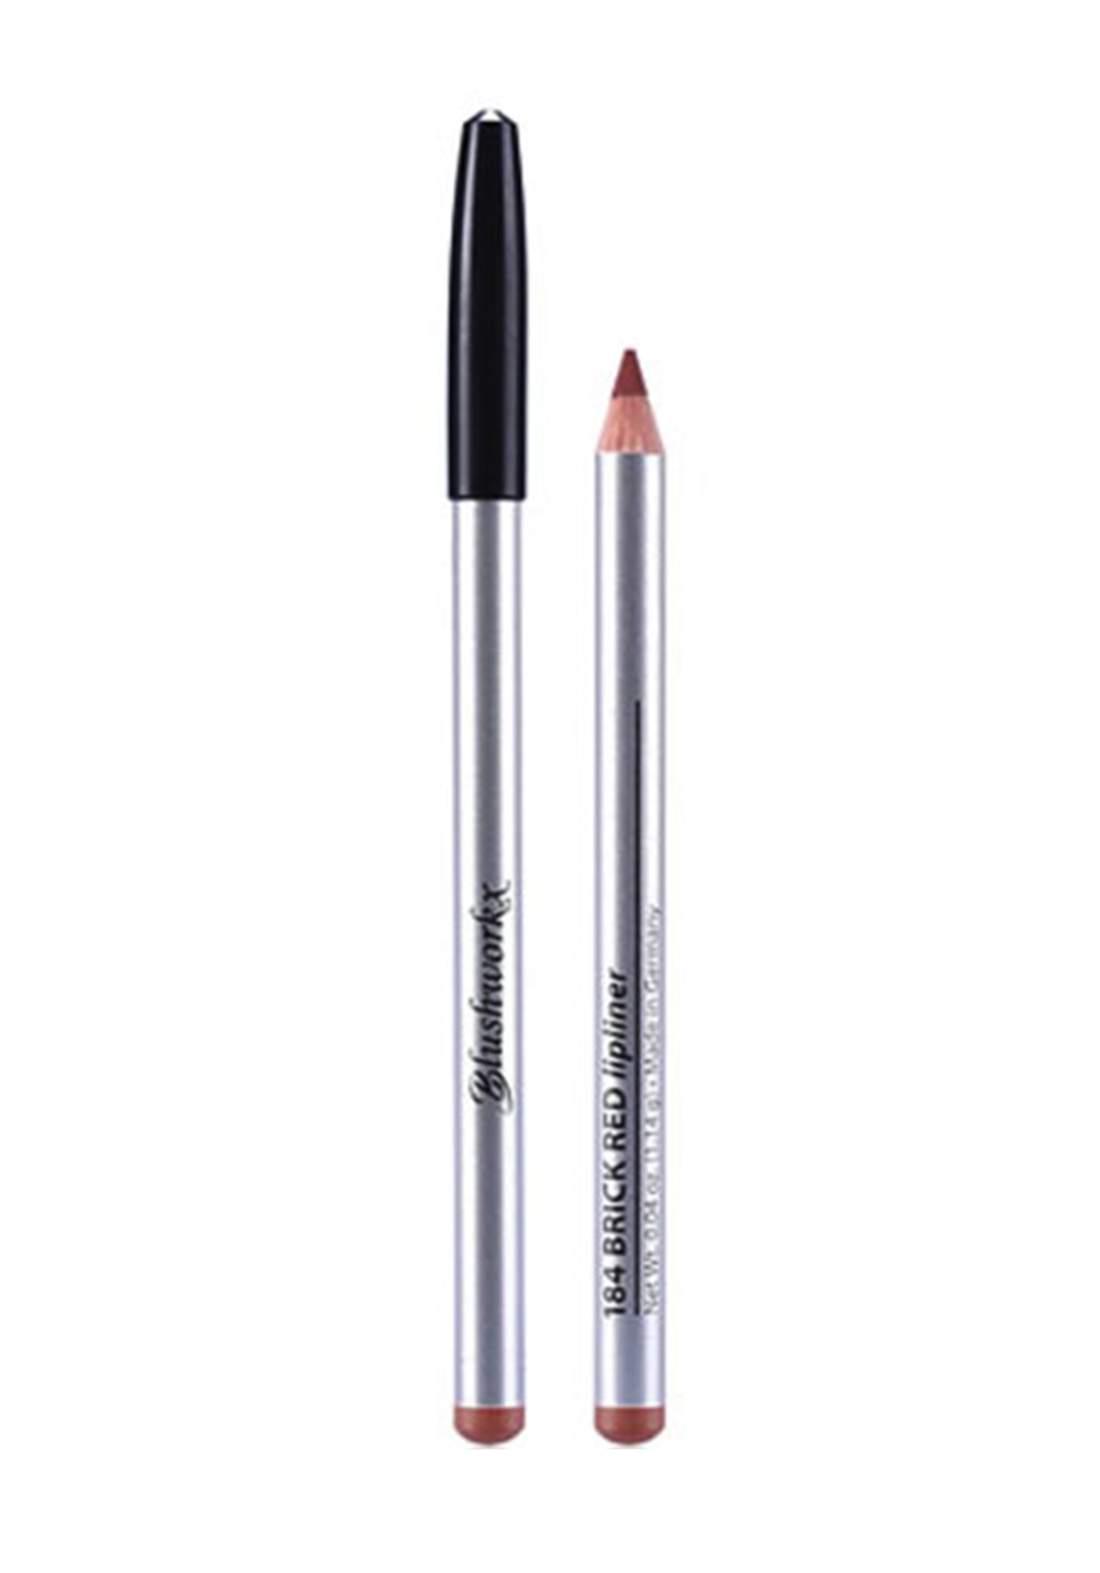 Blushworkx Hollywood Lip Liner Pencil No.192 Pink Nude 1.14g محدد الشفاه